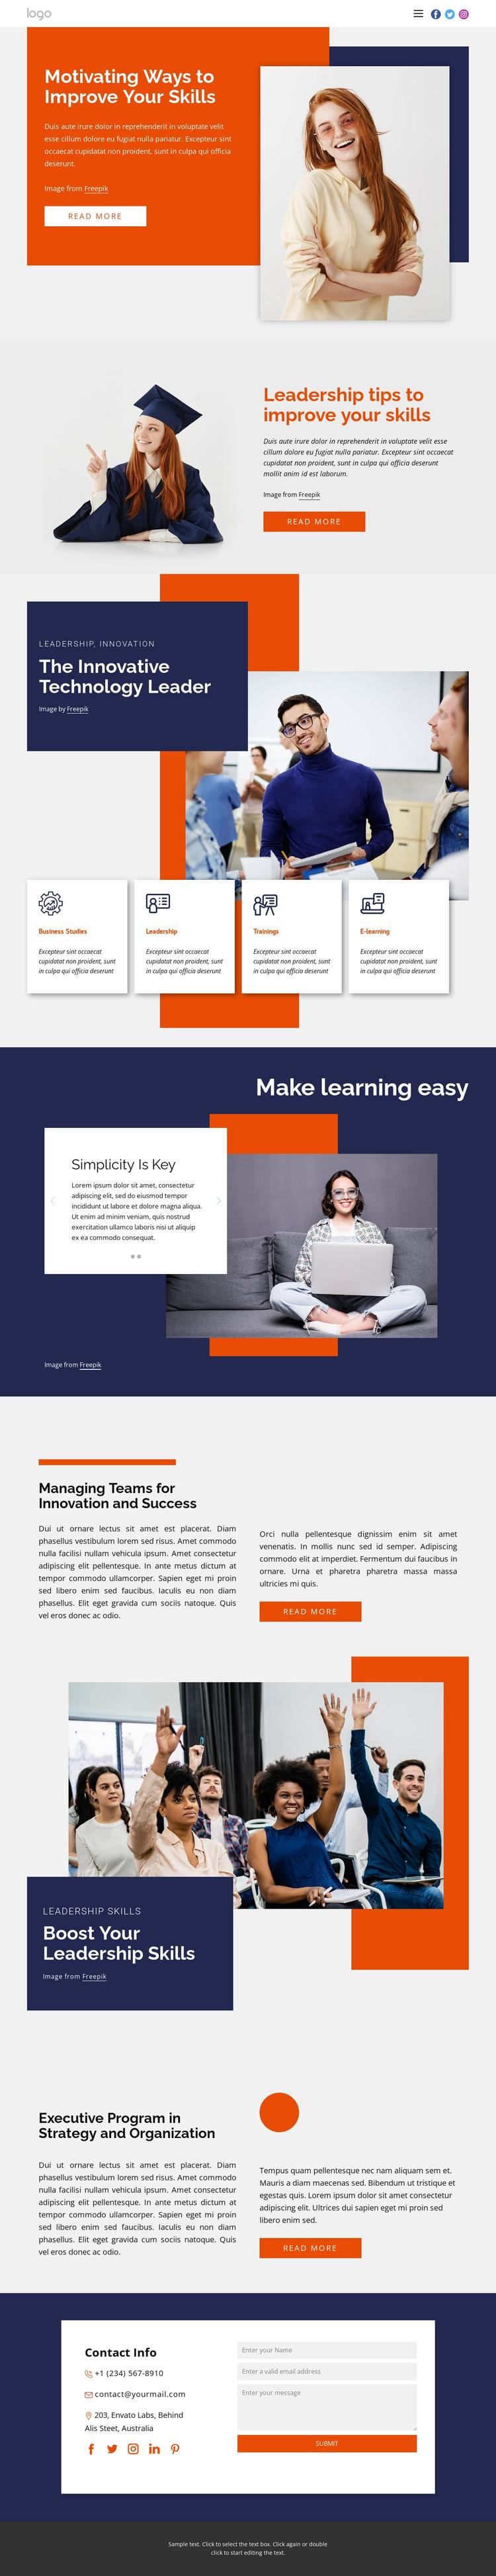 Drive your career forward Web Design